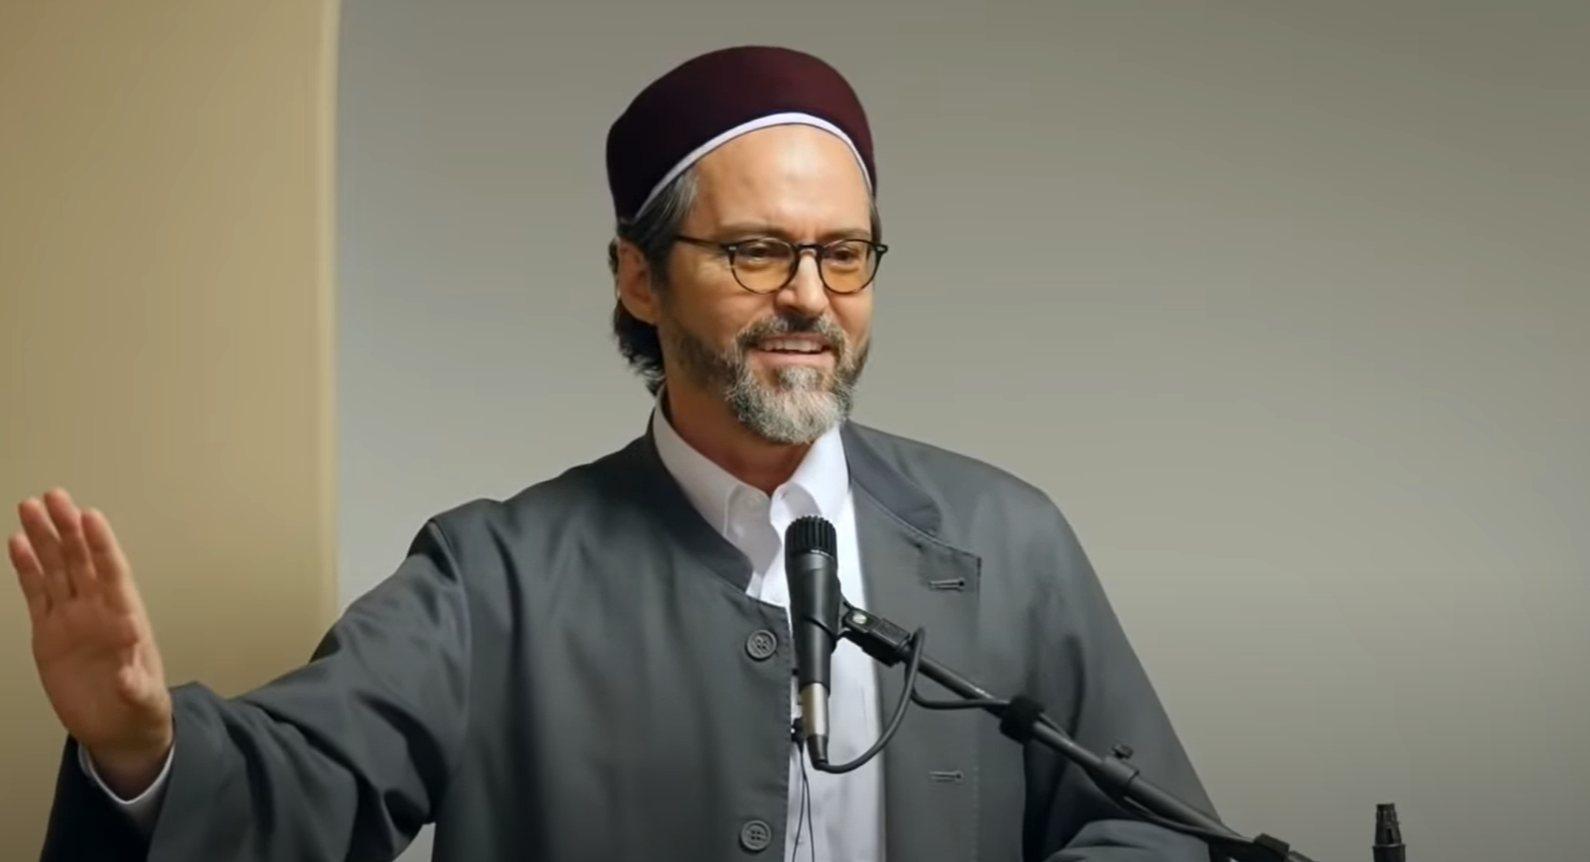 Influential Muslim scholar Hamza Yusuf criticised for backing UAE-Israel deal